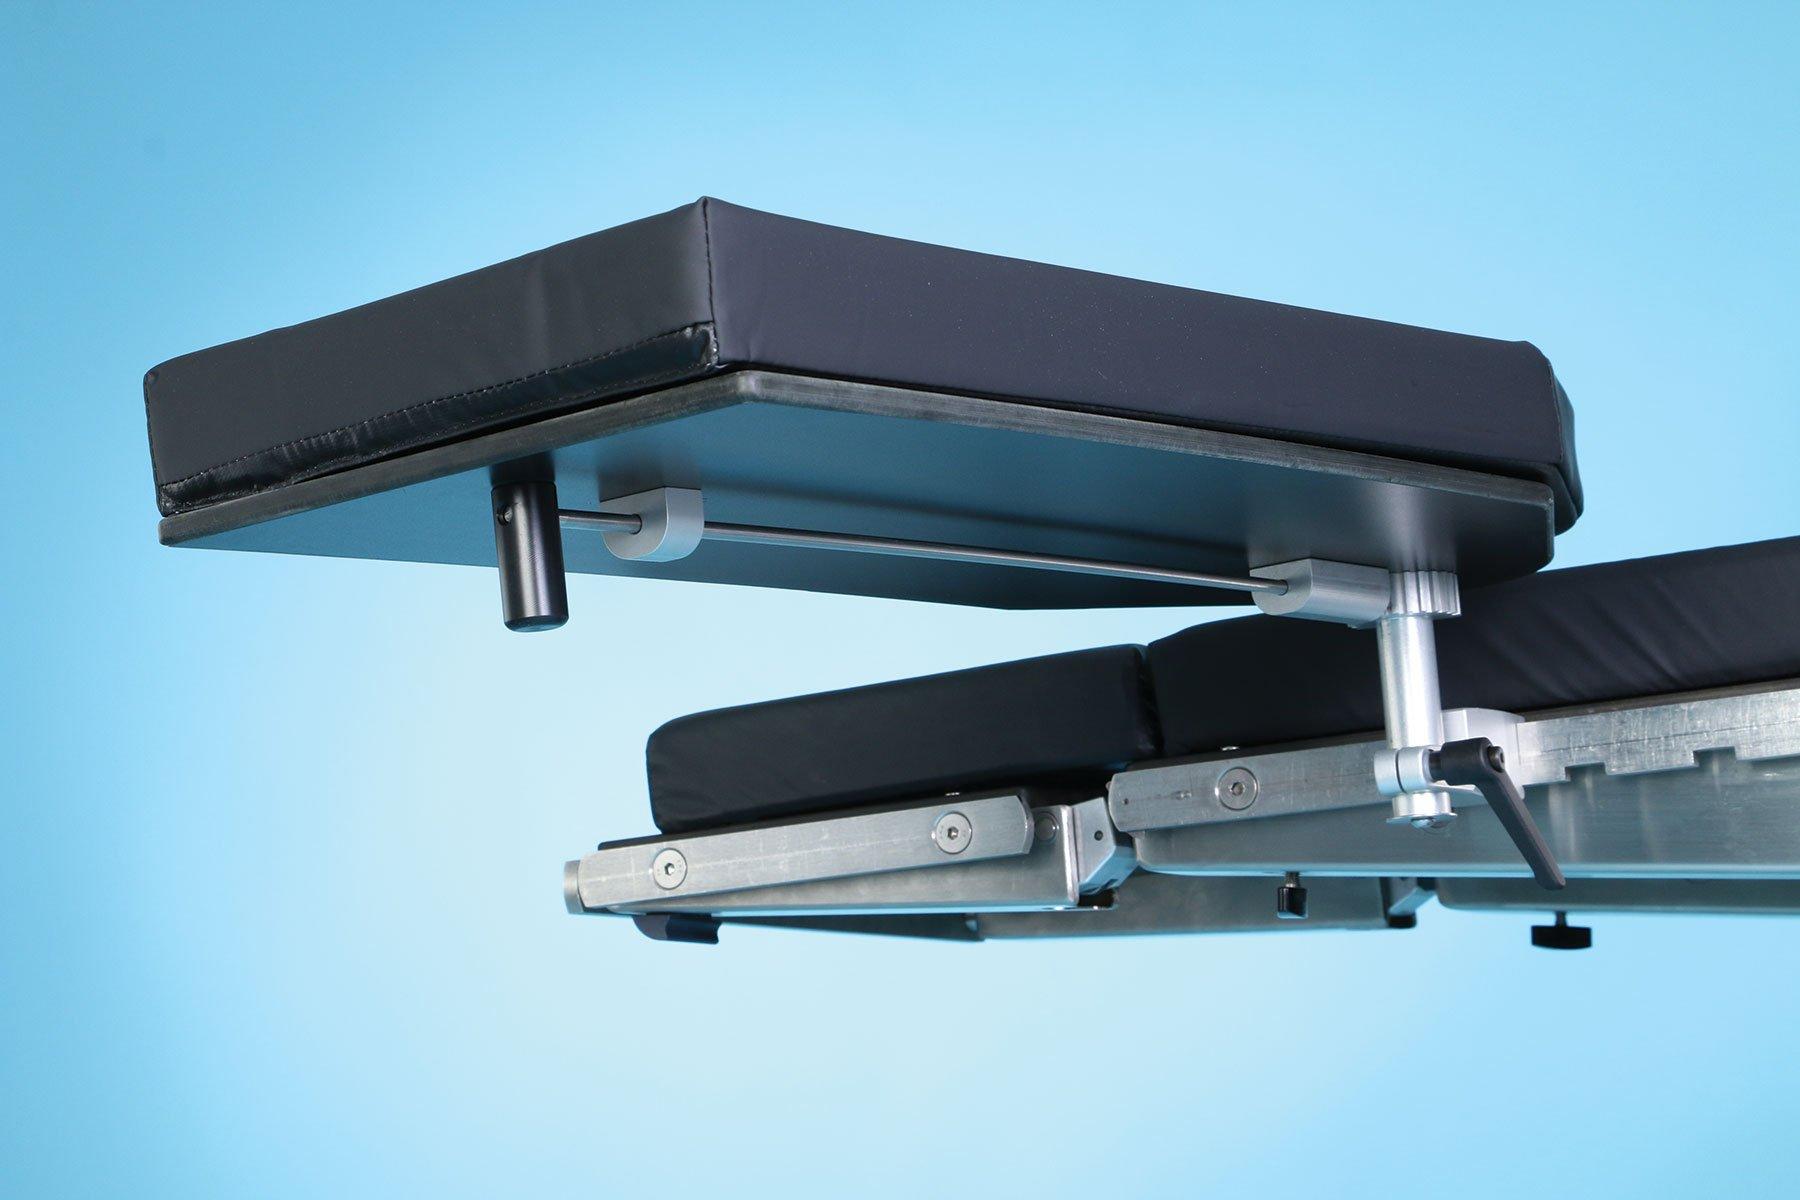 SchureMed 800-0017 Adjustable Height Extra-Wide Armboard